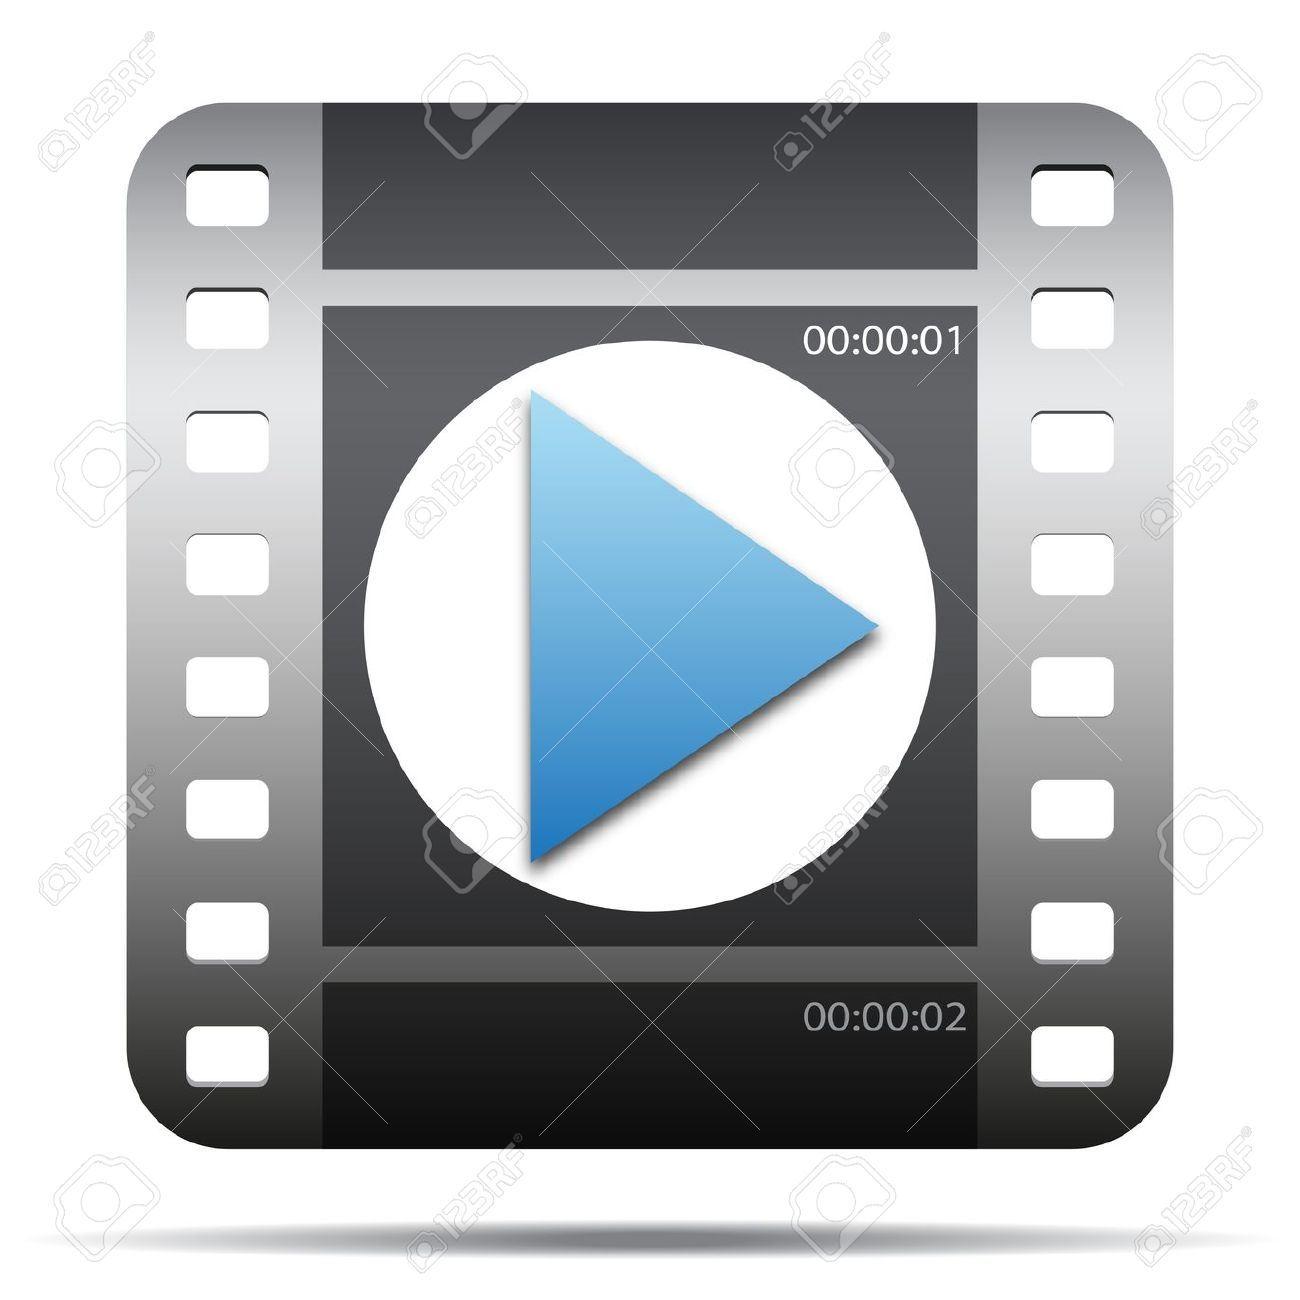 Mad Key - Demo Video